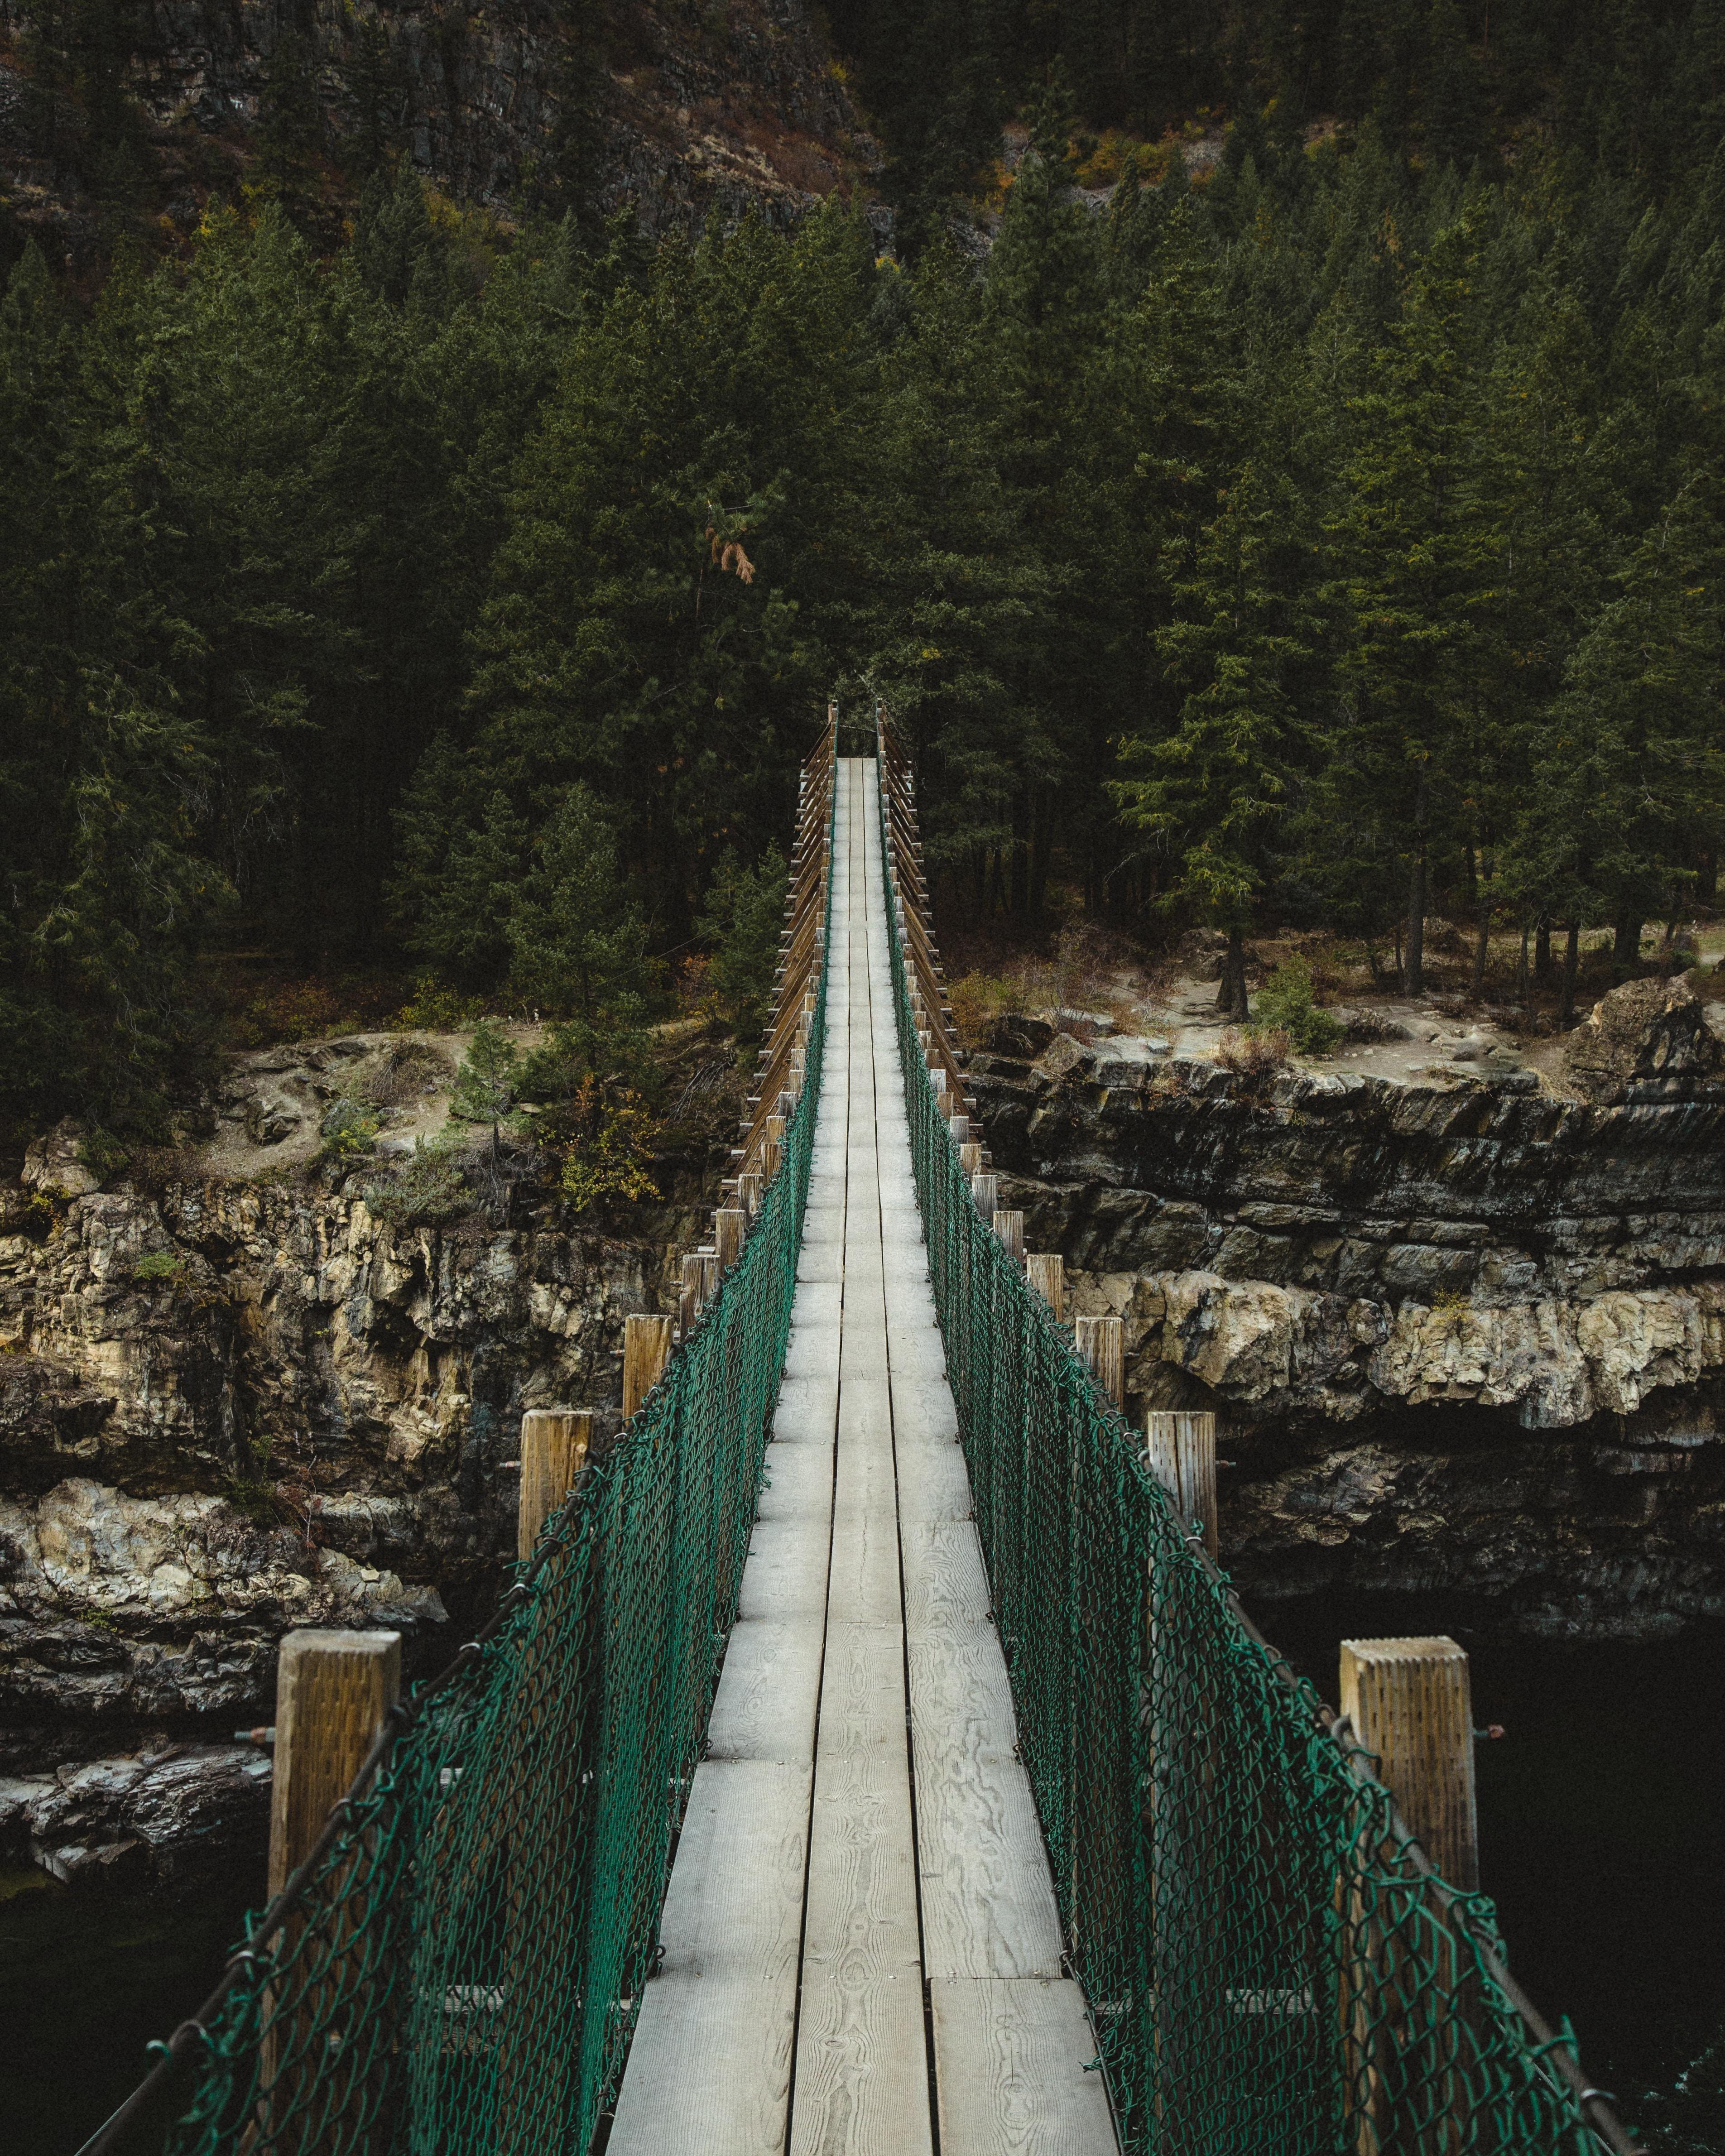 narrow wooden bridge near trees